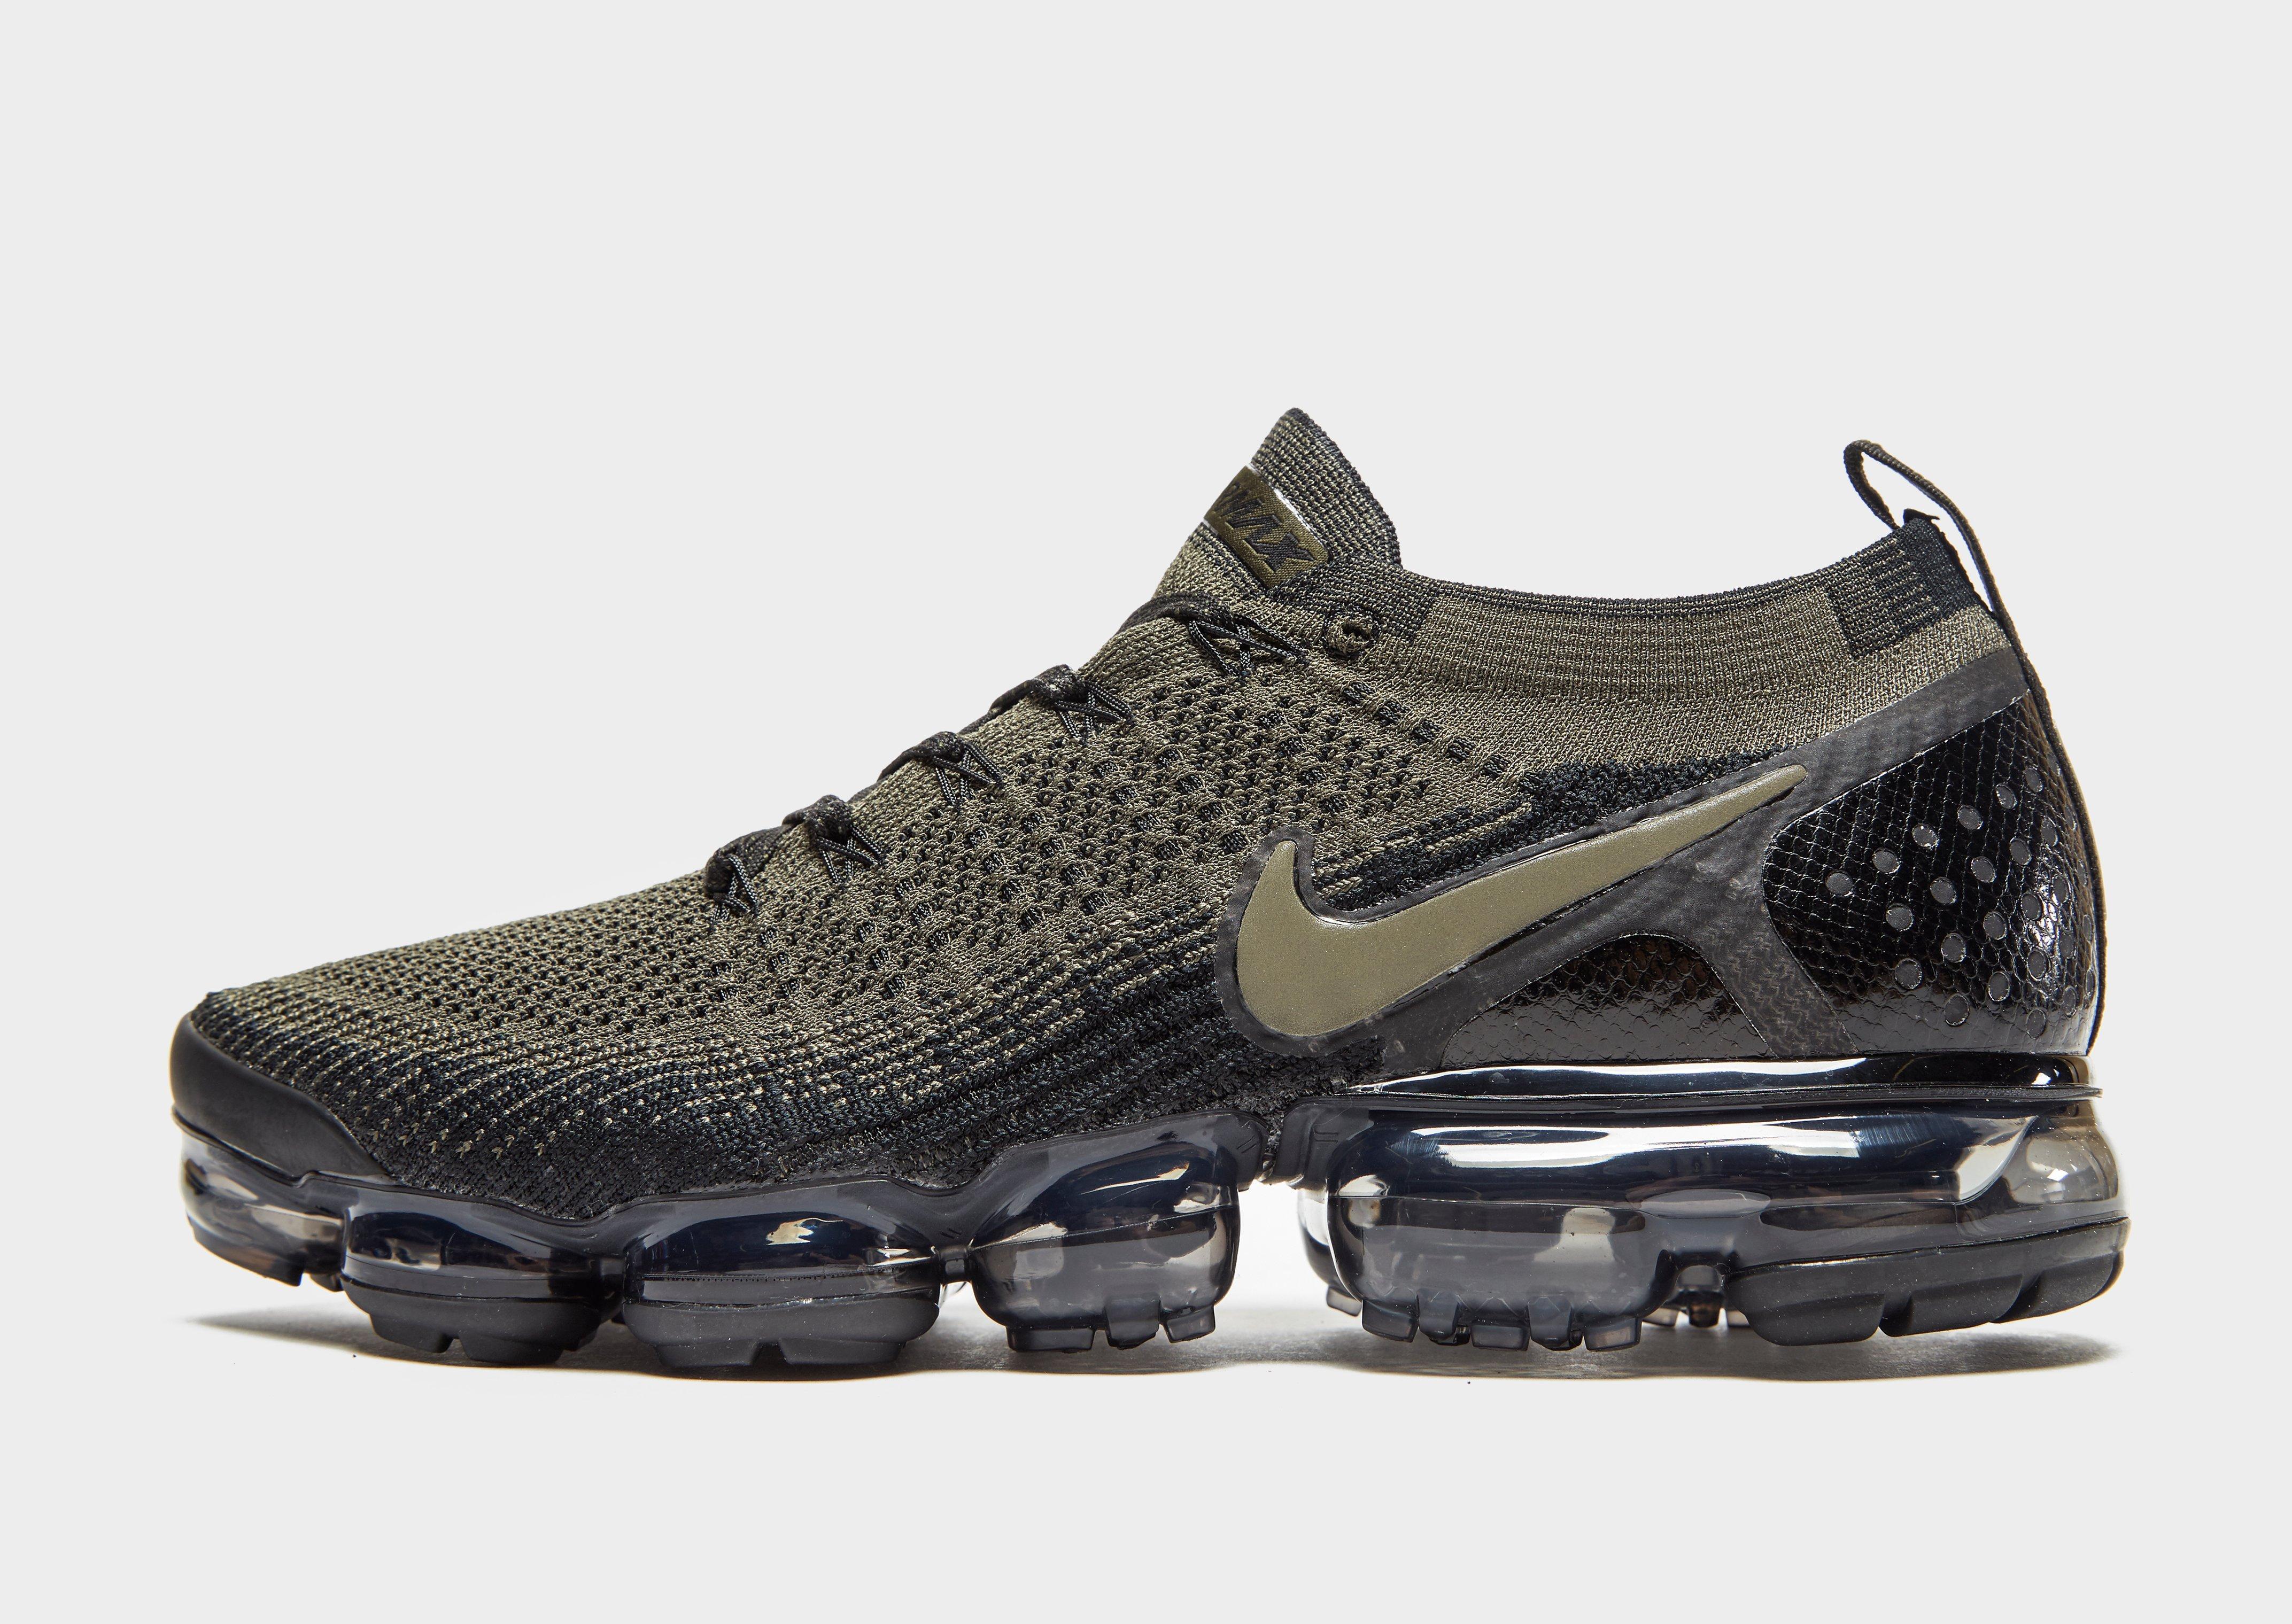 4ae60ac71b Nike Air Vapormax Flyknit 2 Snake Shoe in Black for Men - Lyst